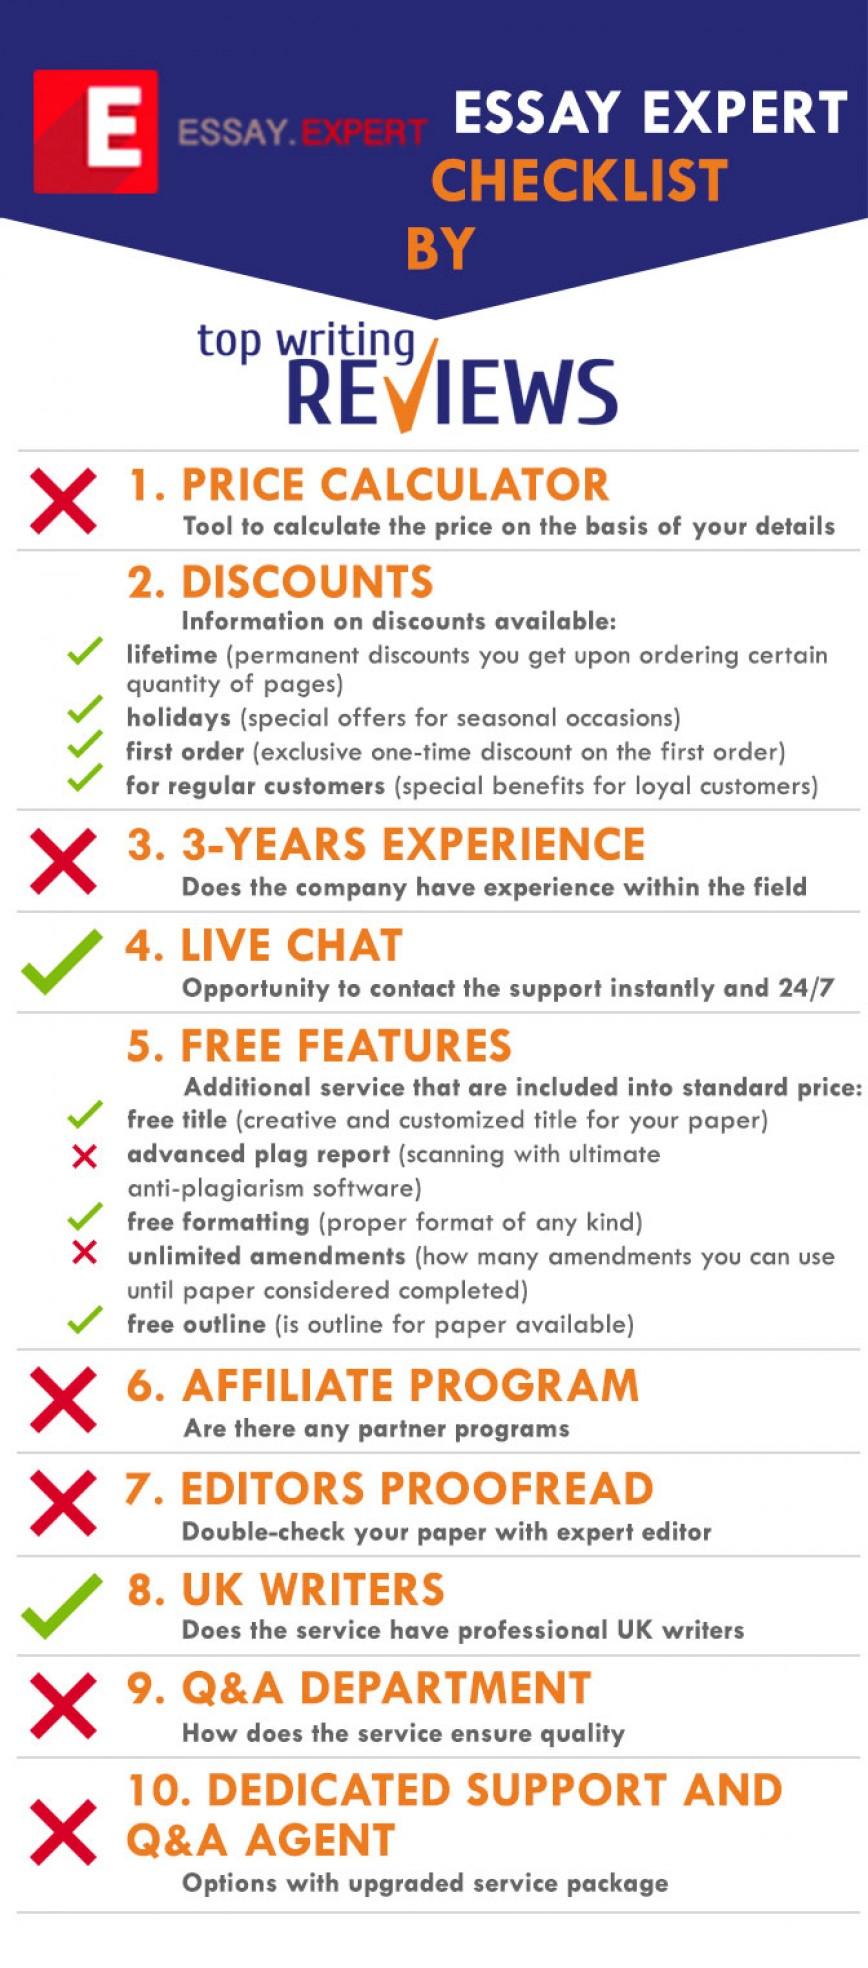 009 Essay Pro Reviews Service Review Expert Testimonials Prices Checklist Of Essayexpert By Topwritingre Writing Services Uk Smart Australian Forum Australia Outstanding Writer